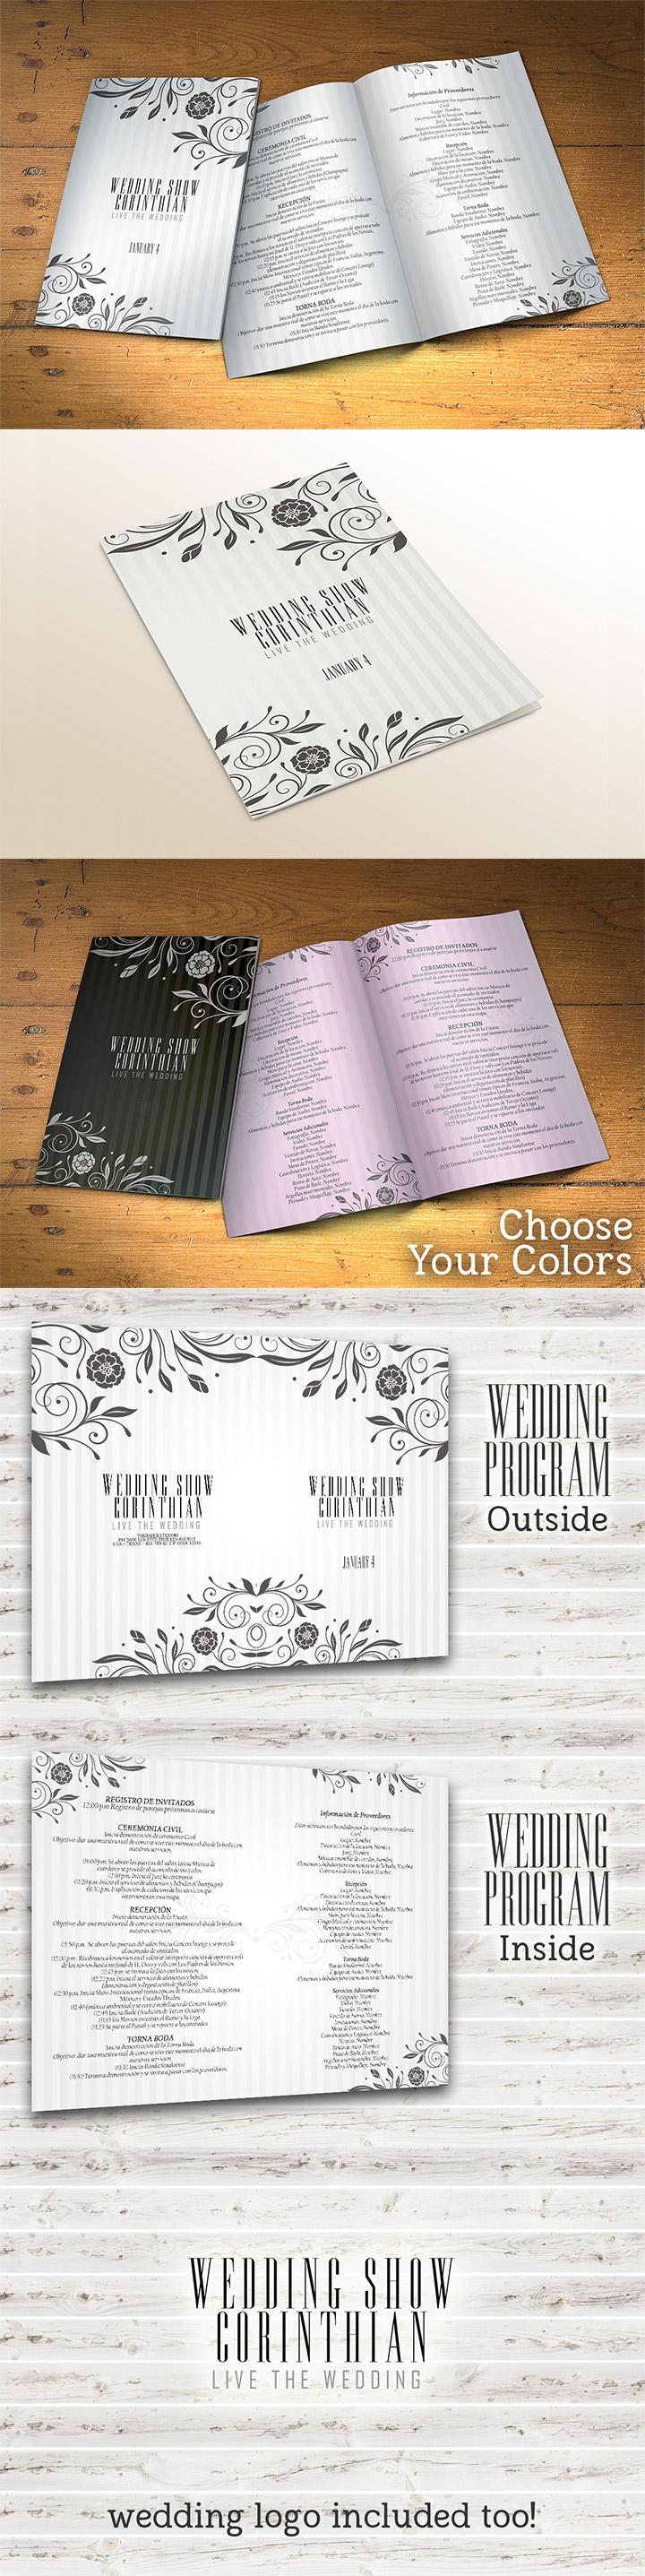 Wedding Program Template PSD 2 Sides